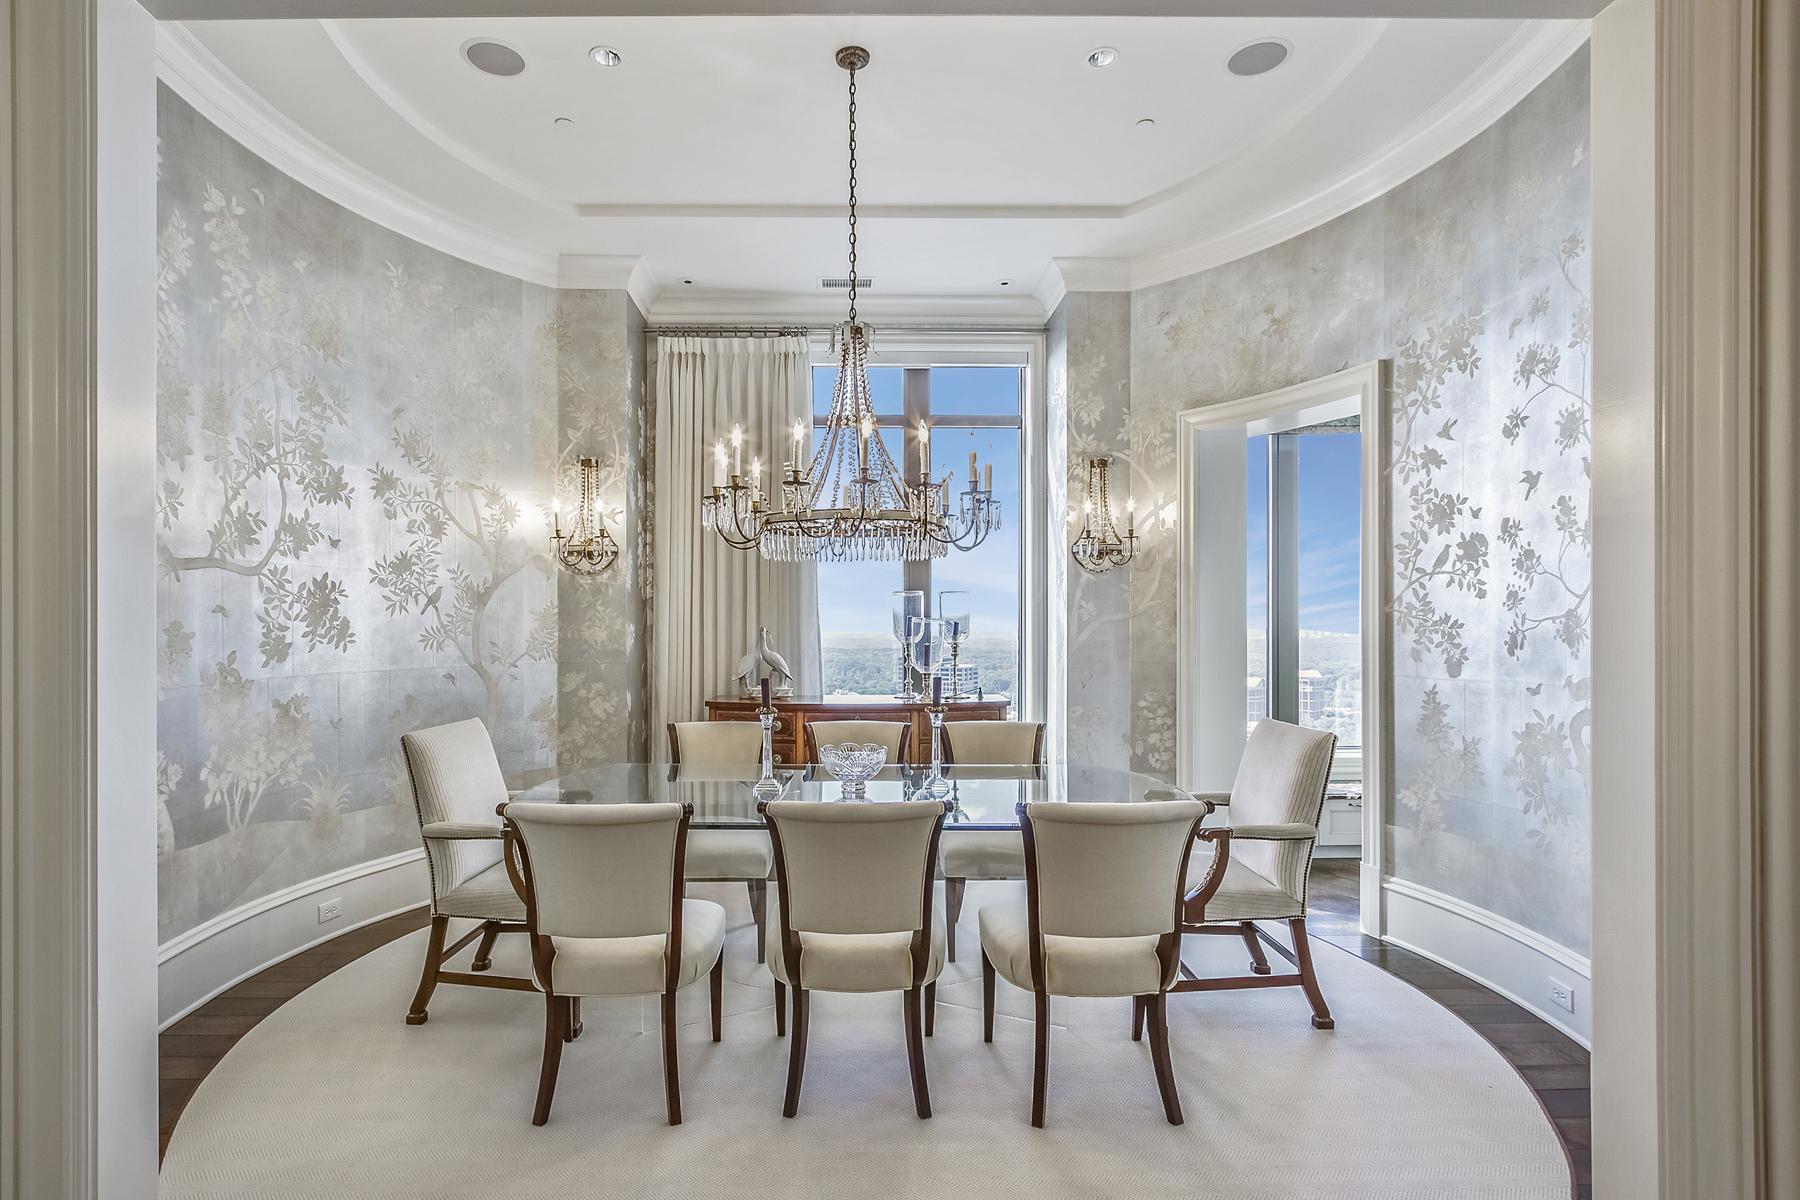 Condomínio para Venda às Unsurpassed Luxury At Mandarin Oriental Residences 3376 Peachtree Road NE No. 47A Atlanta, Geórgia 30326 Estados Unidos